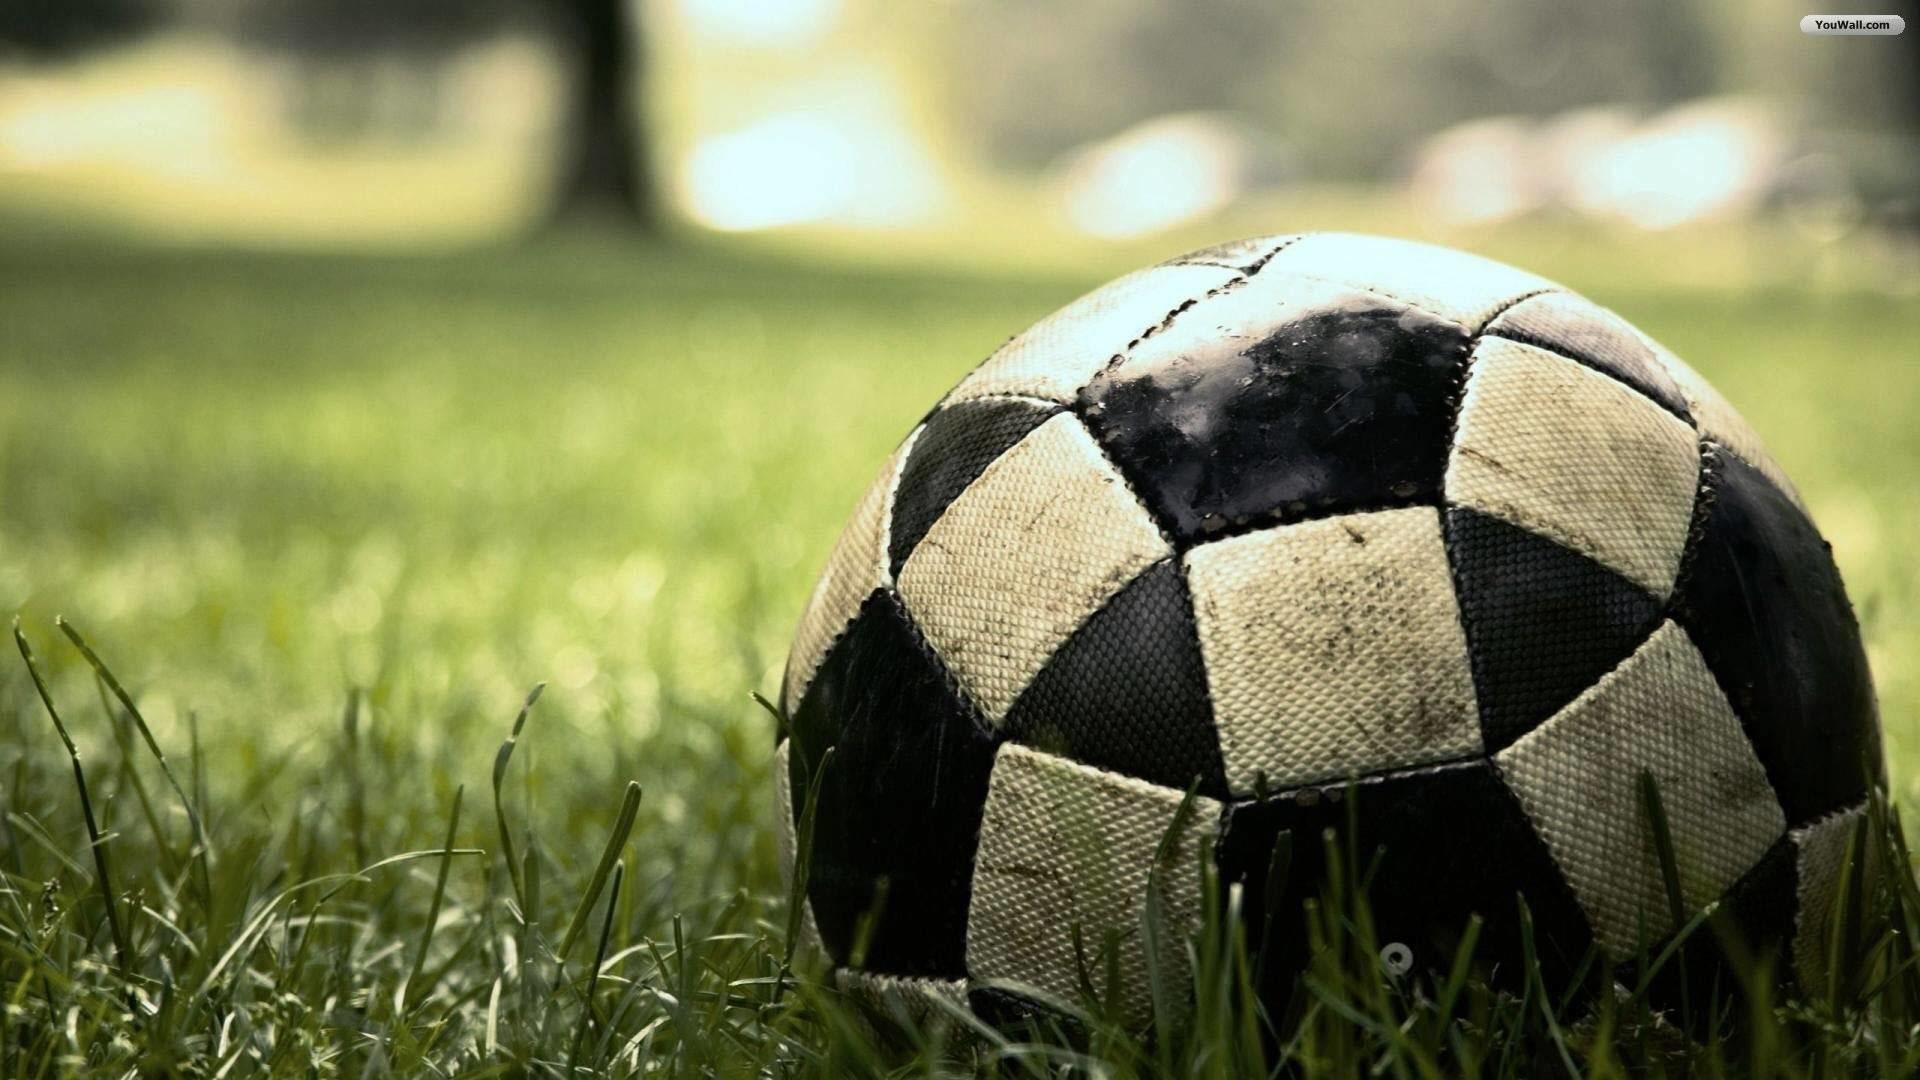 Soccer Wallpaper 64 Images